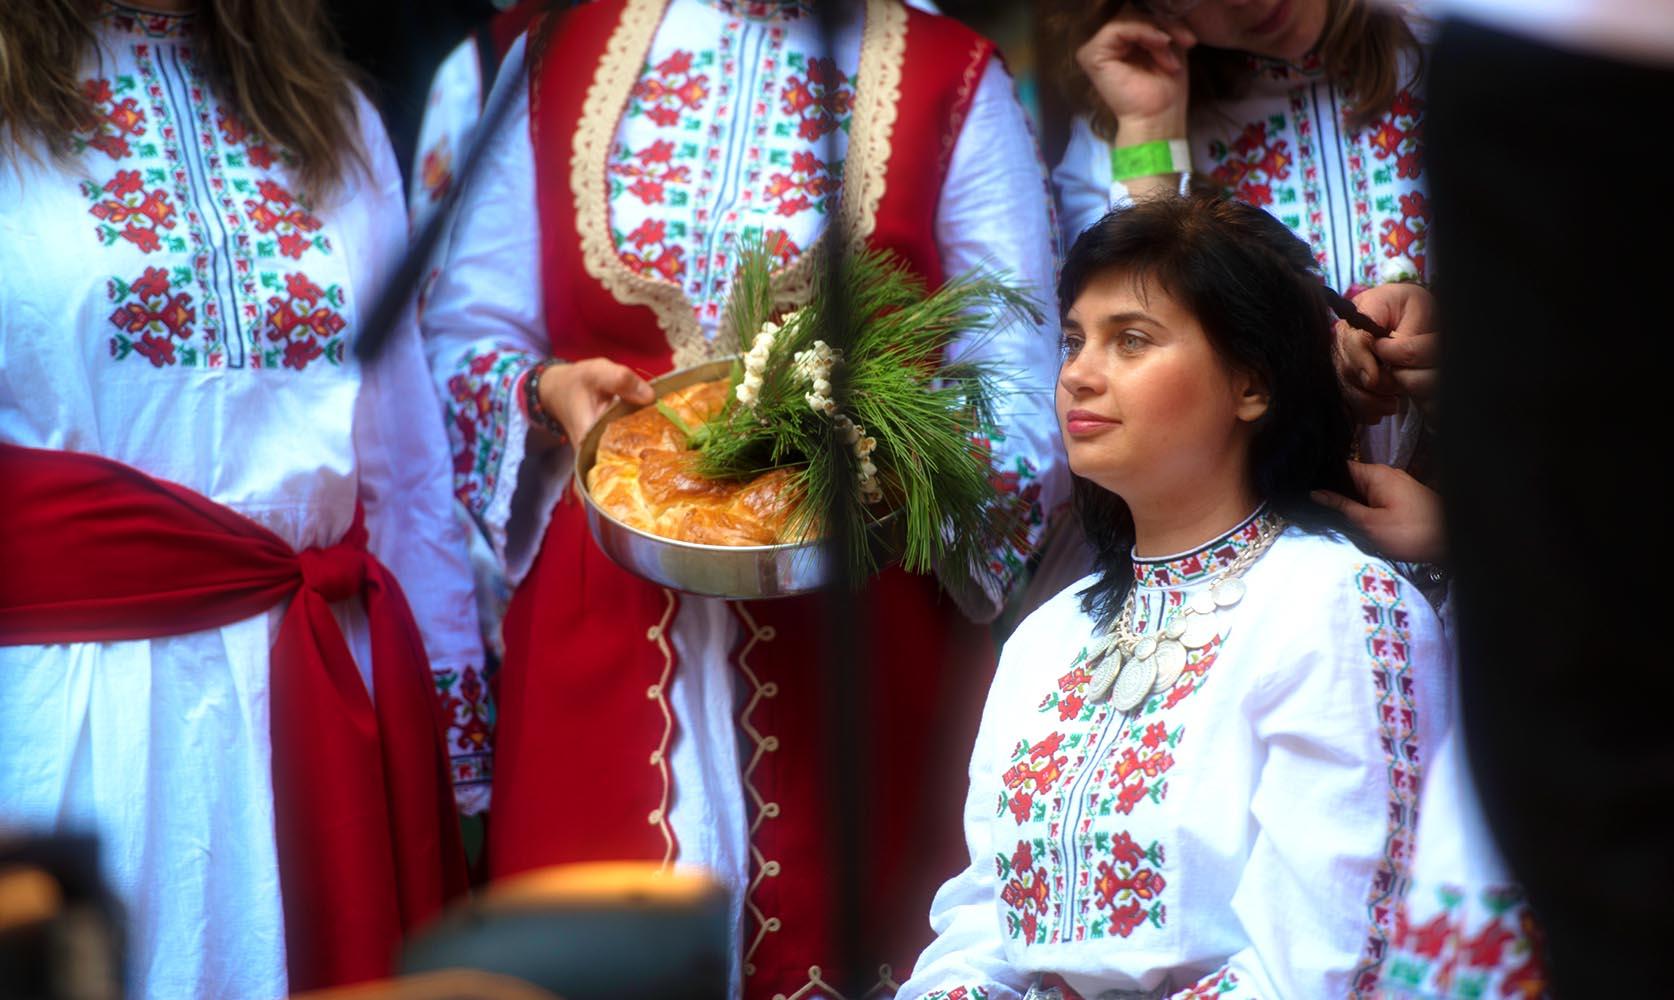 PCHELA-BULGARIAN_SOCIETY-US-9